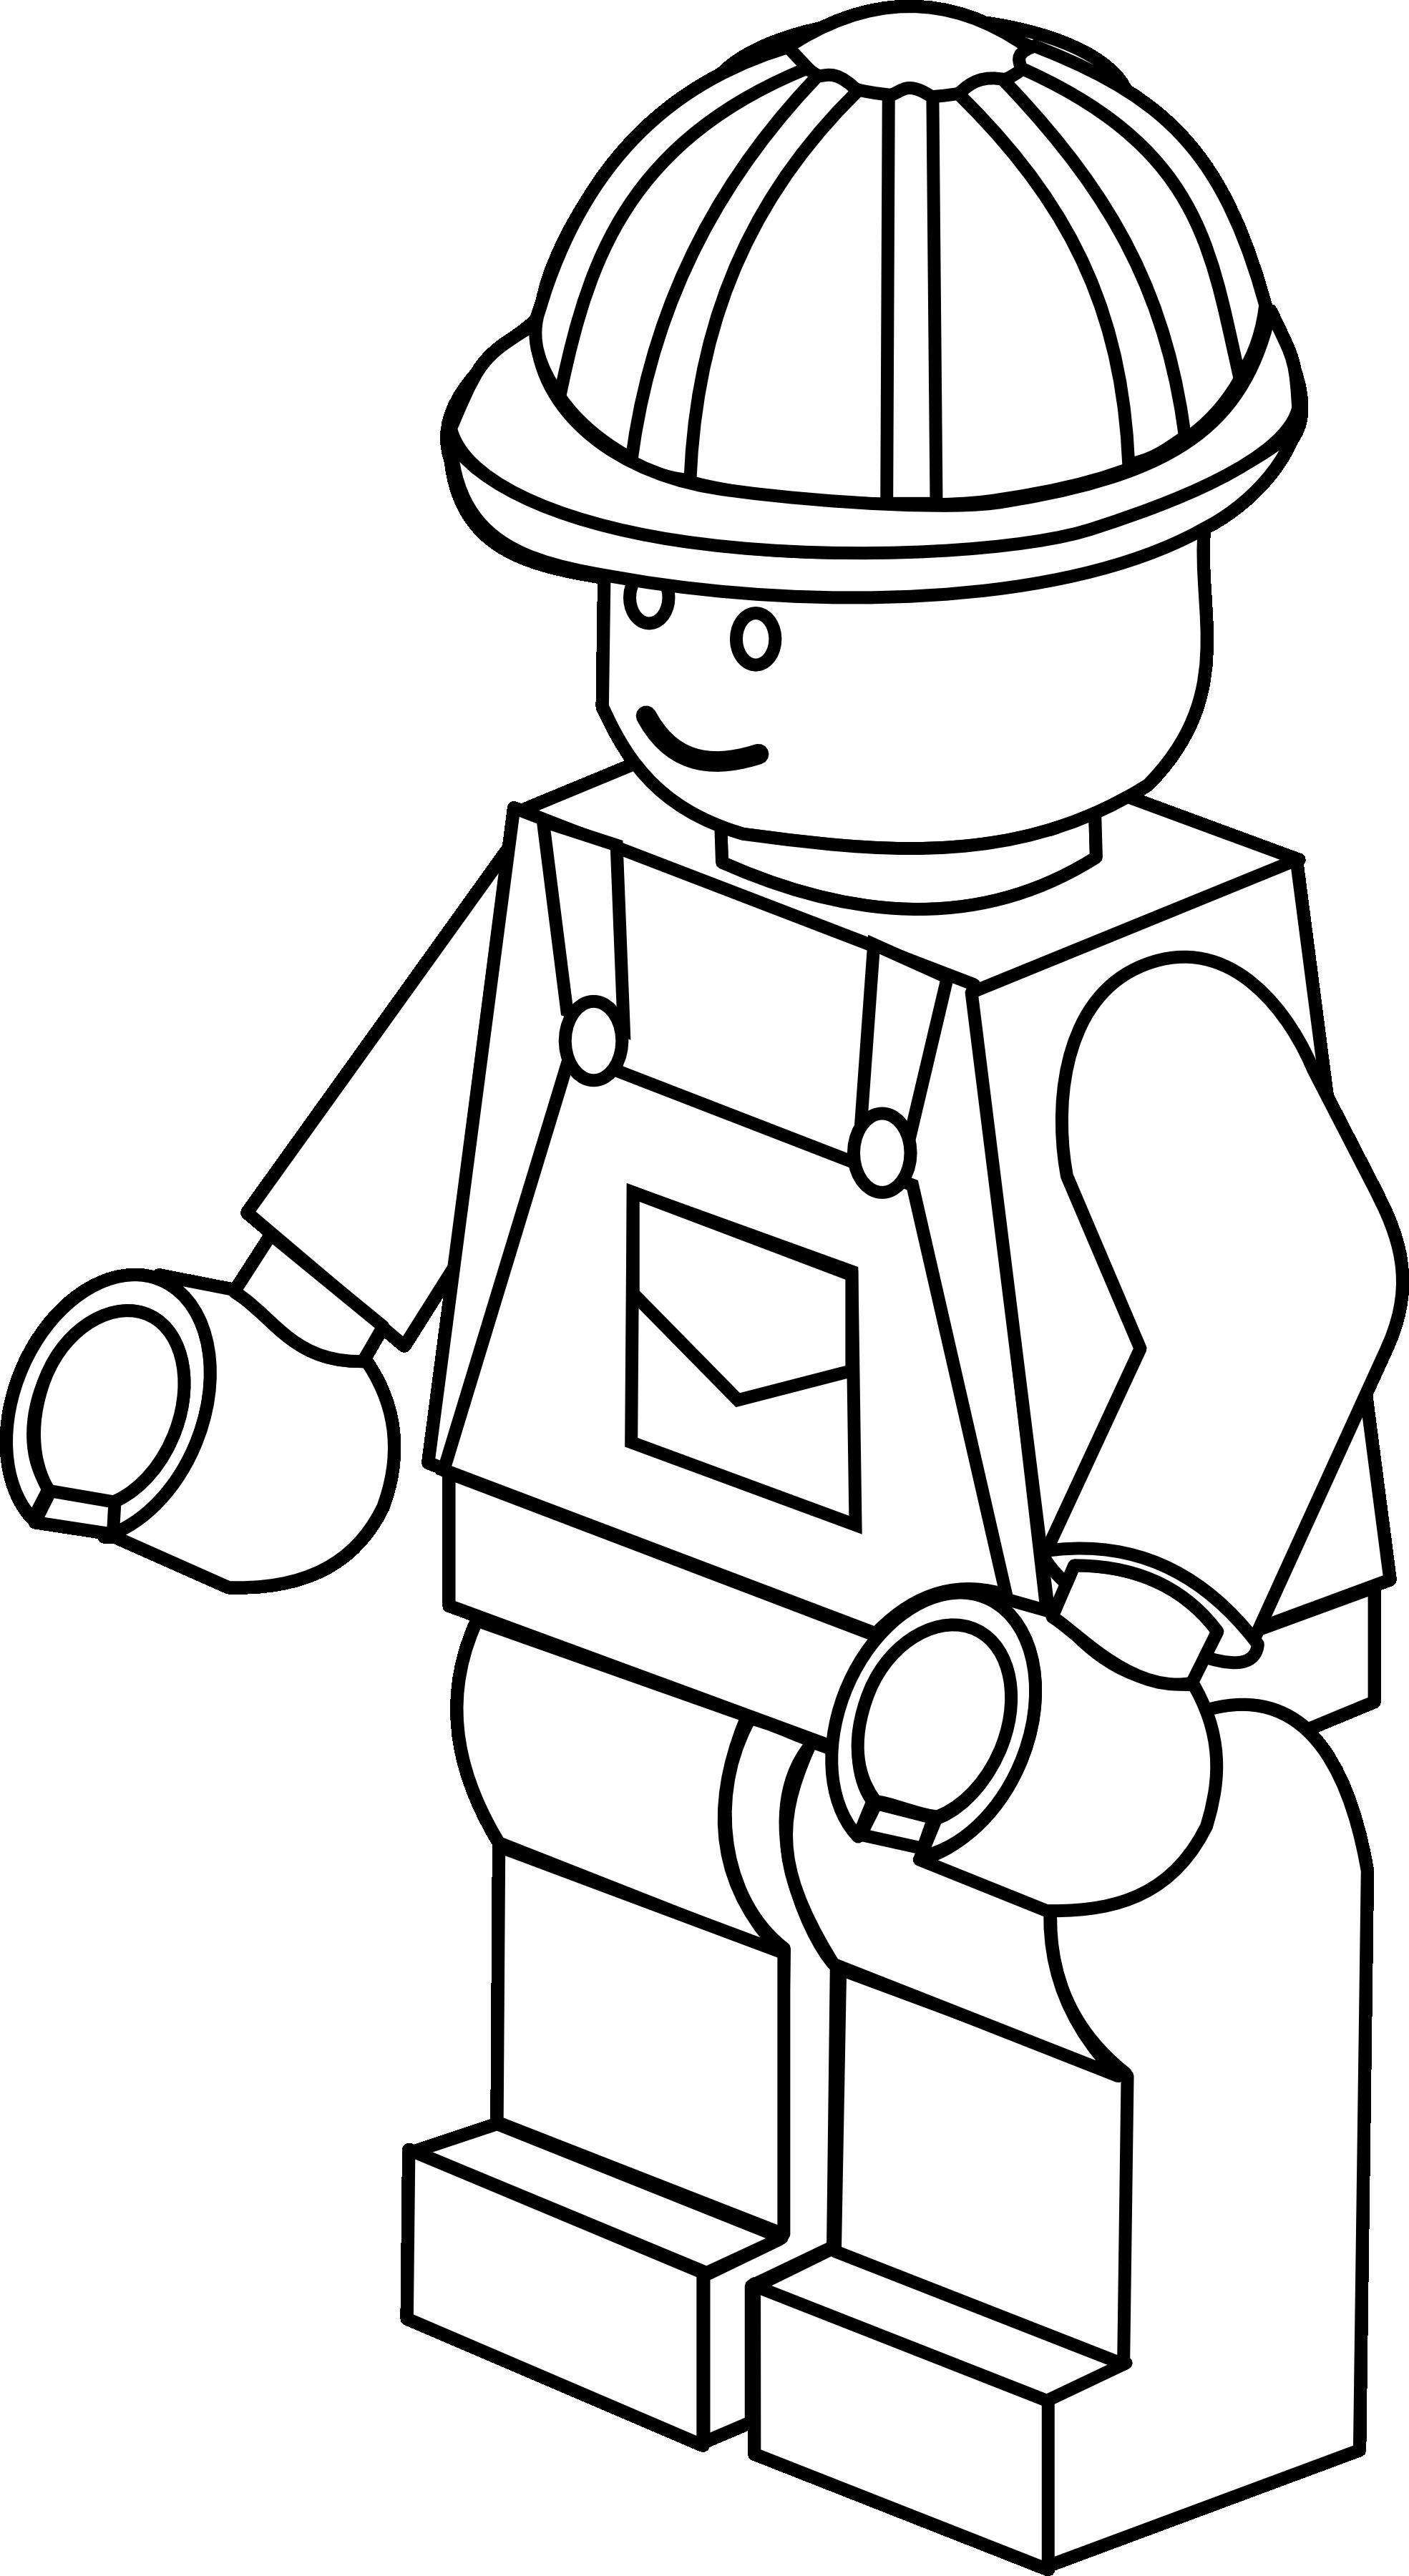 More Complex Lego Figure Colouring Sheet